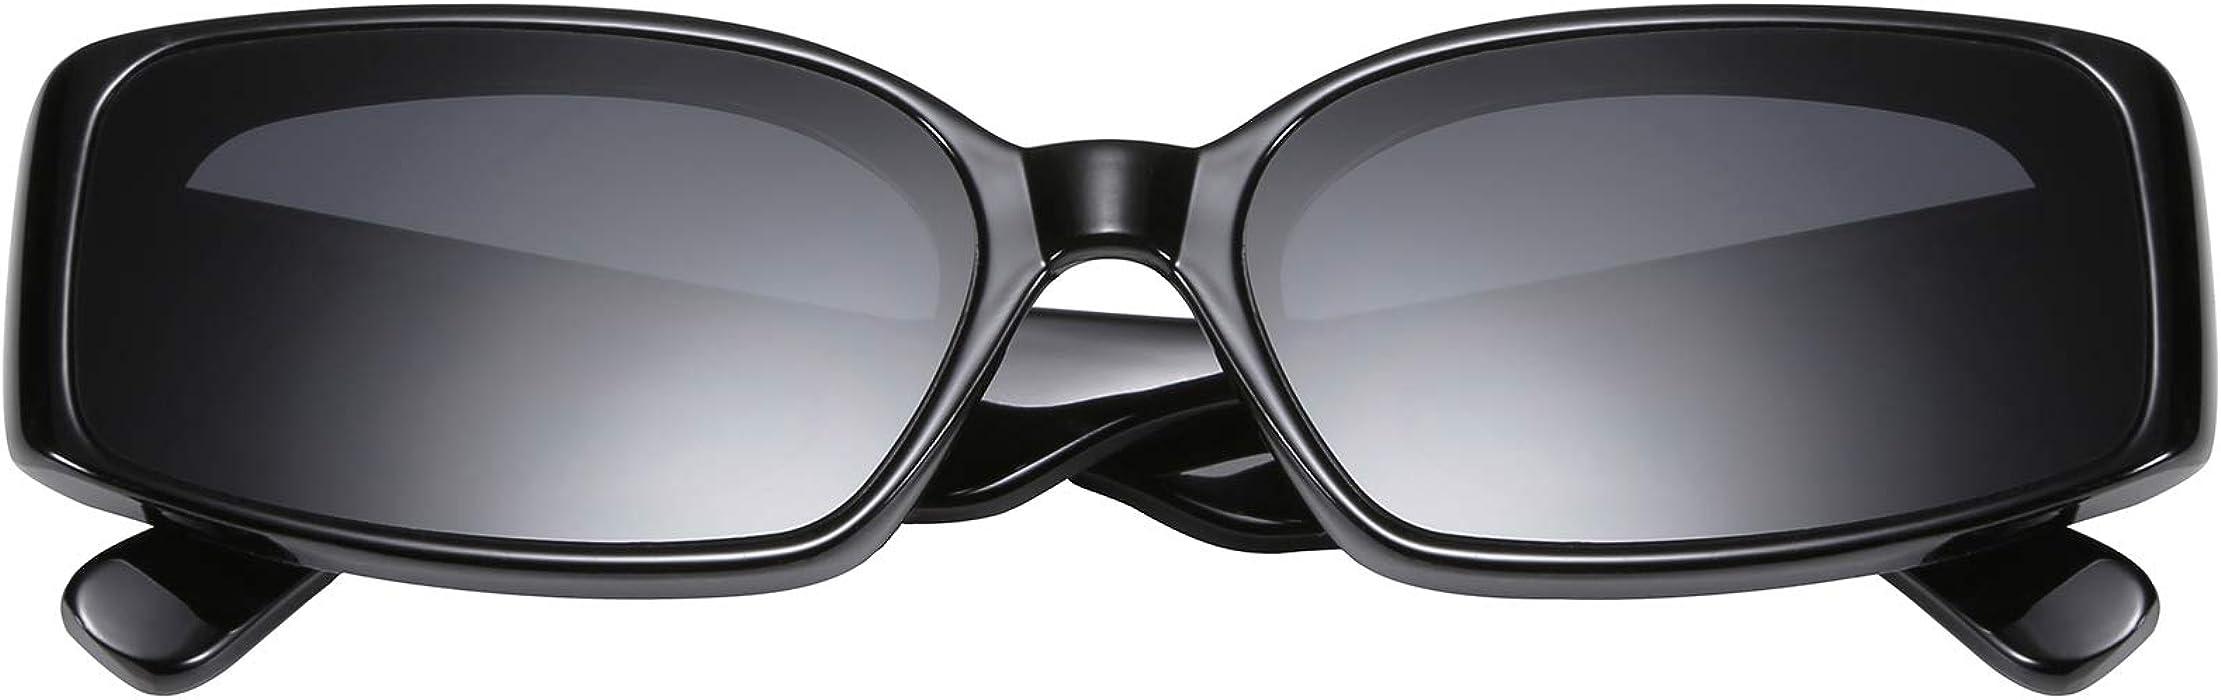 bd88fcec242 Creative Rectangle Sunglasses Women Fashion Thick Frame UV400 Protection  B2462